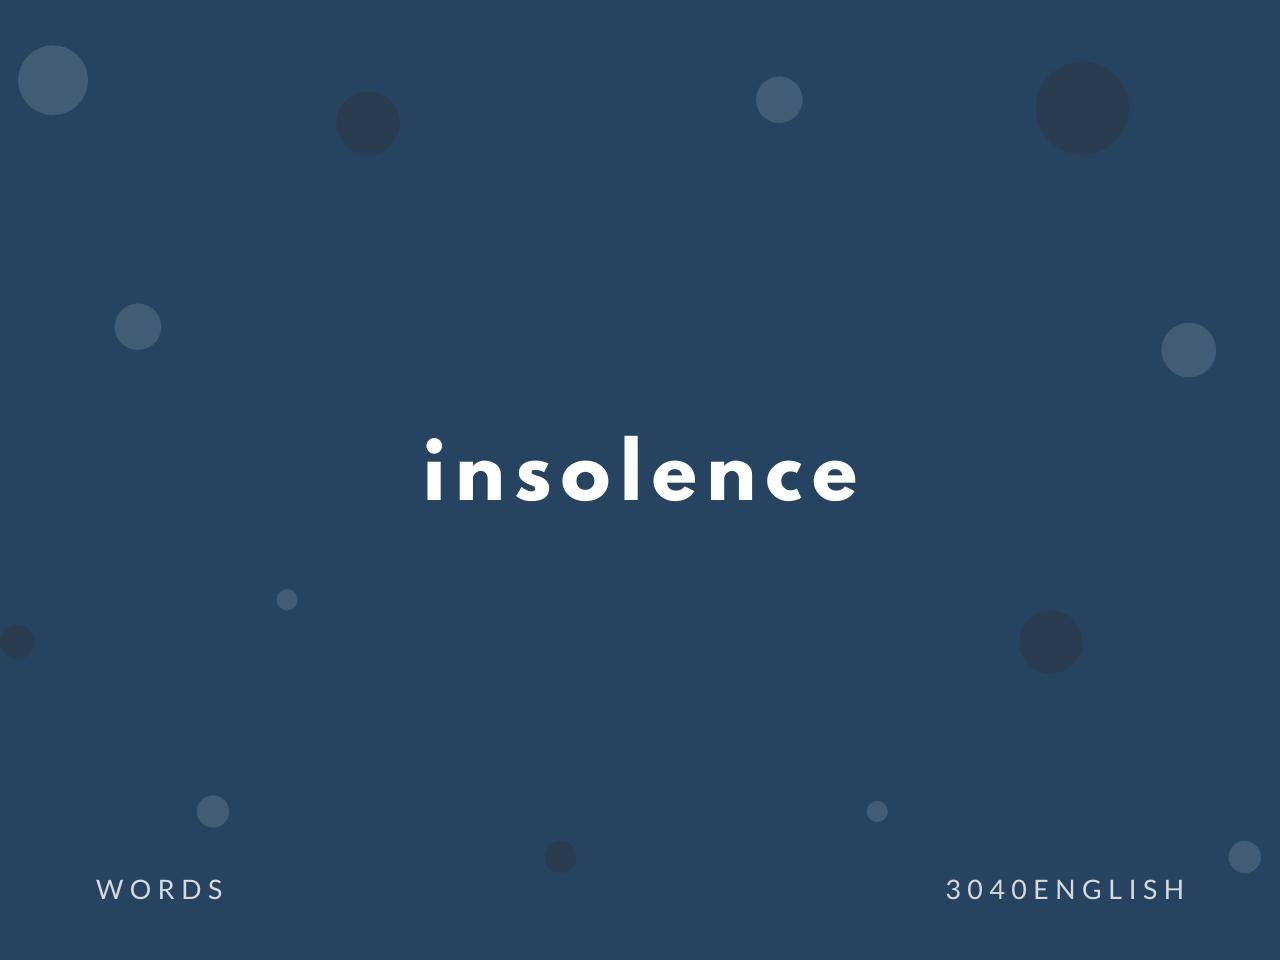 insolence の意味と簡単な使い方【音読用例文あり】